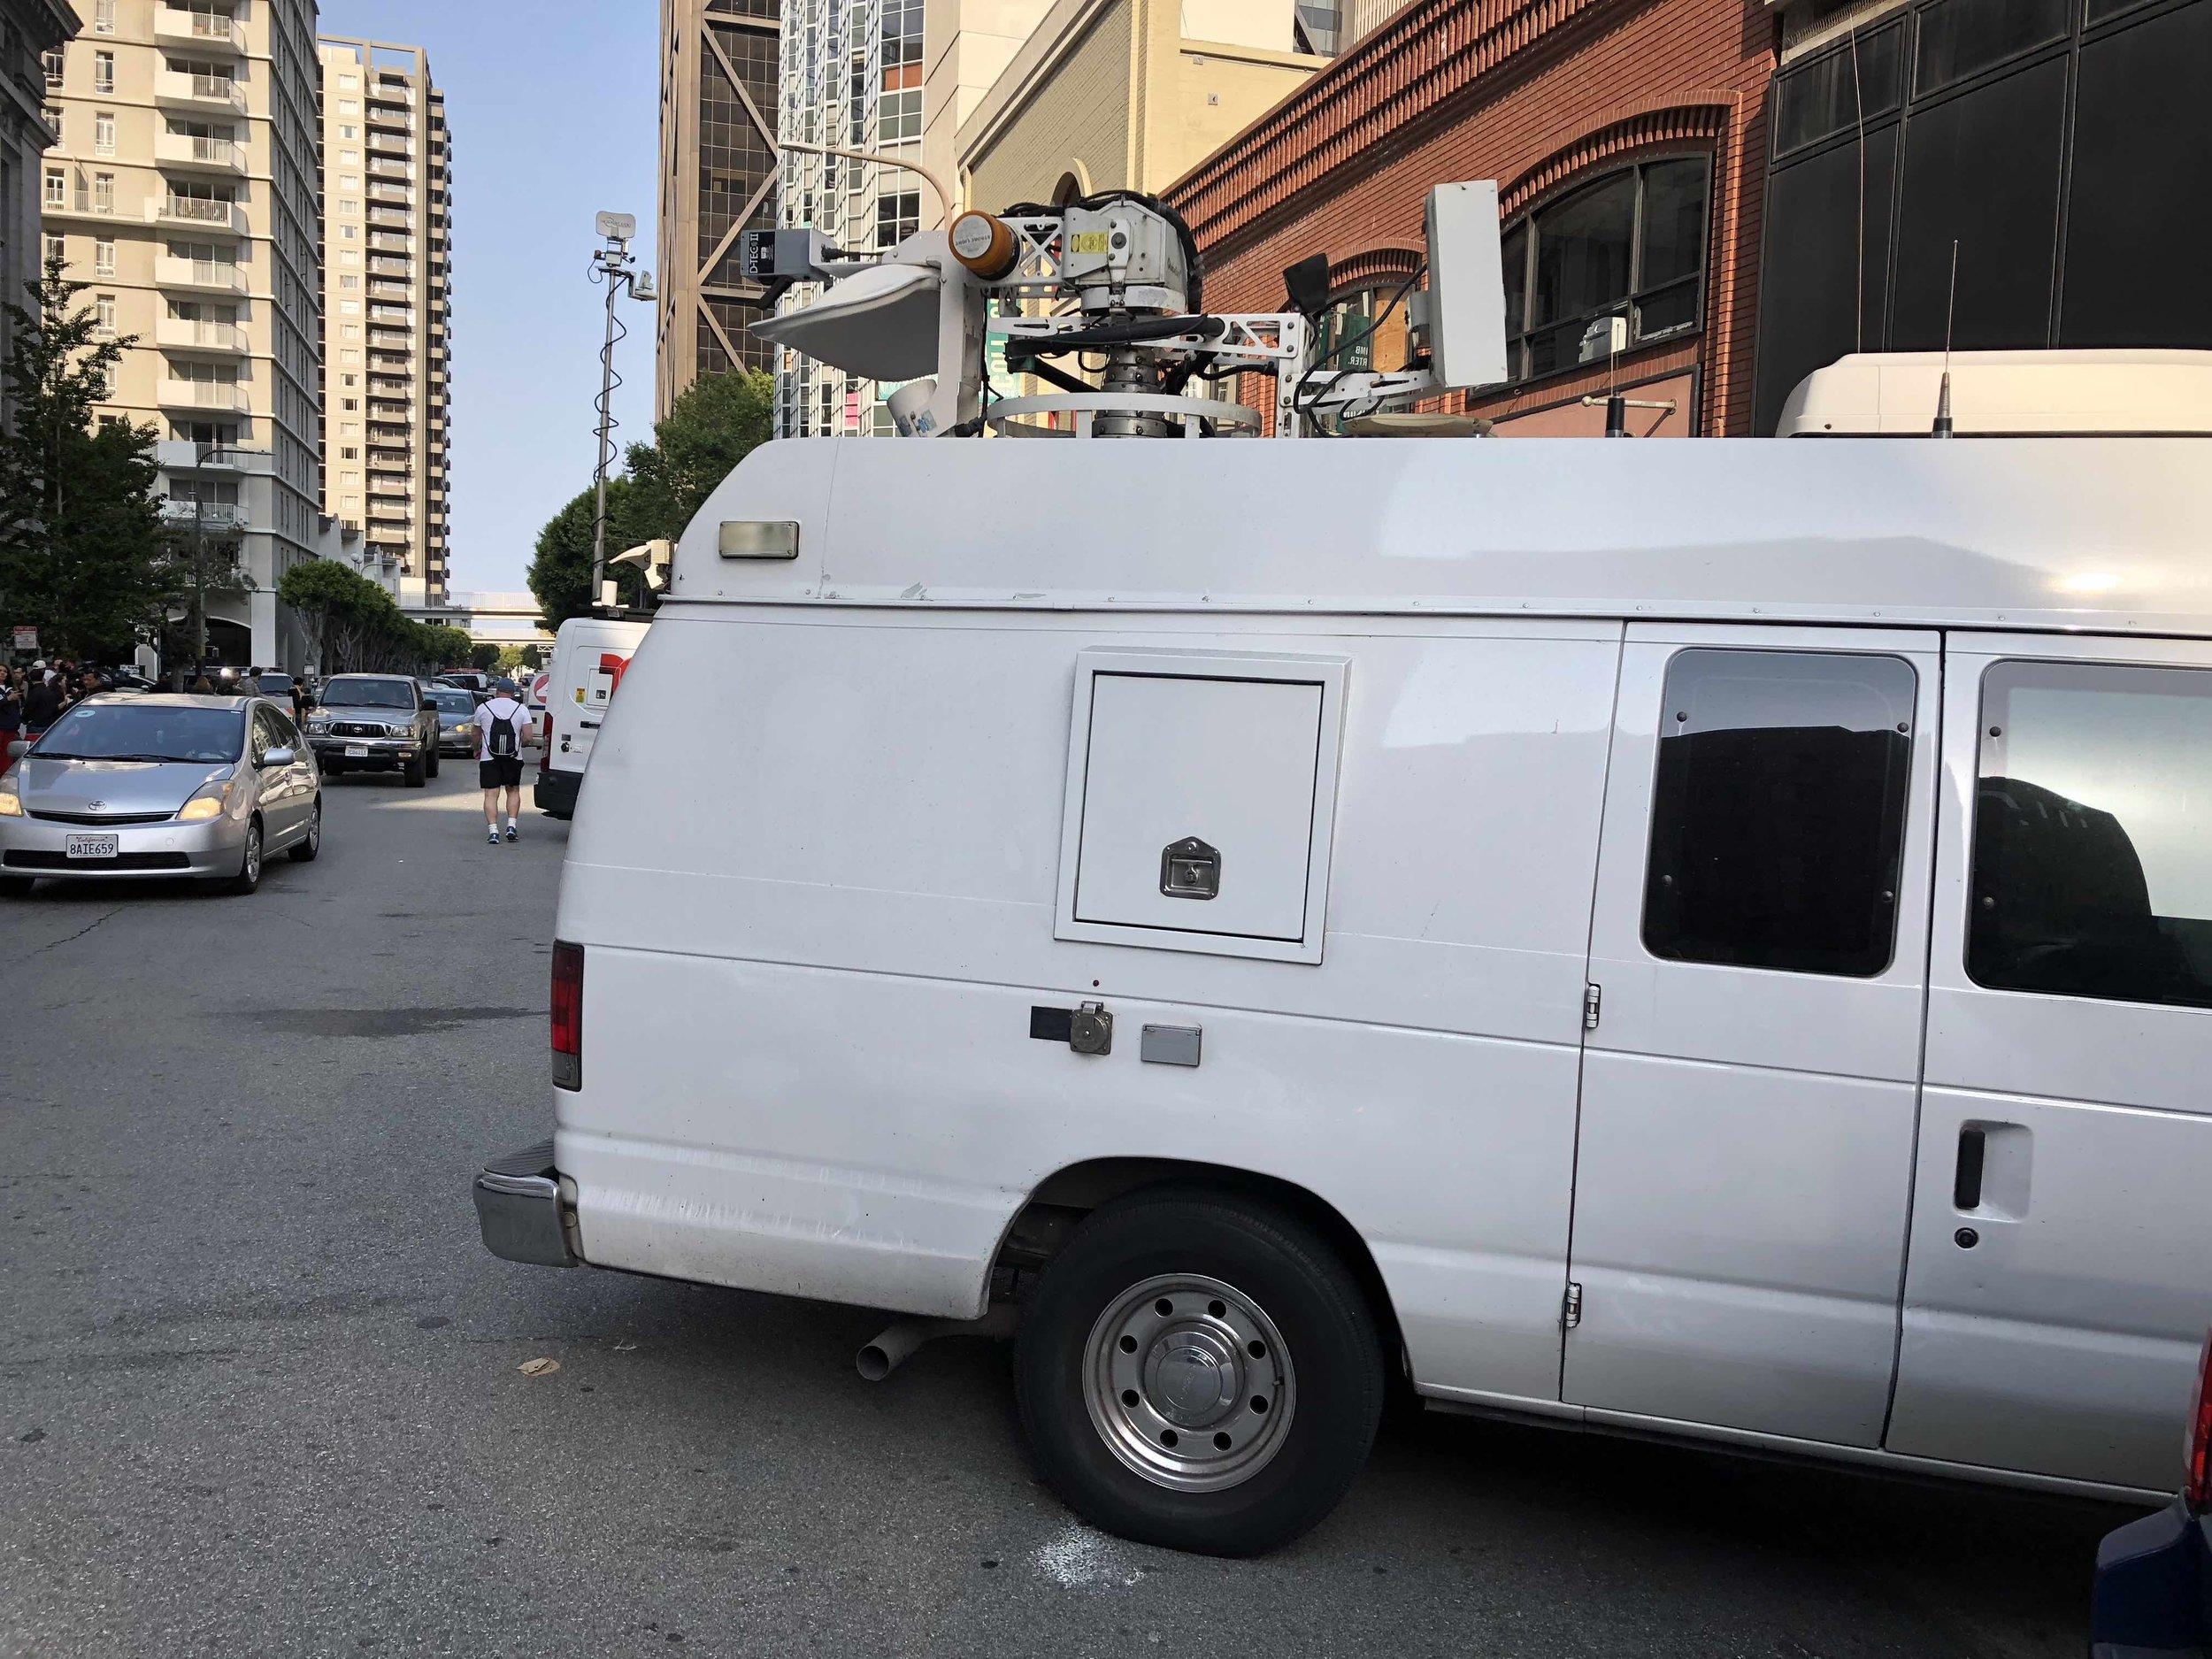 The traditional huge news van.